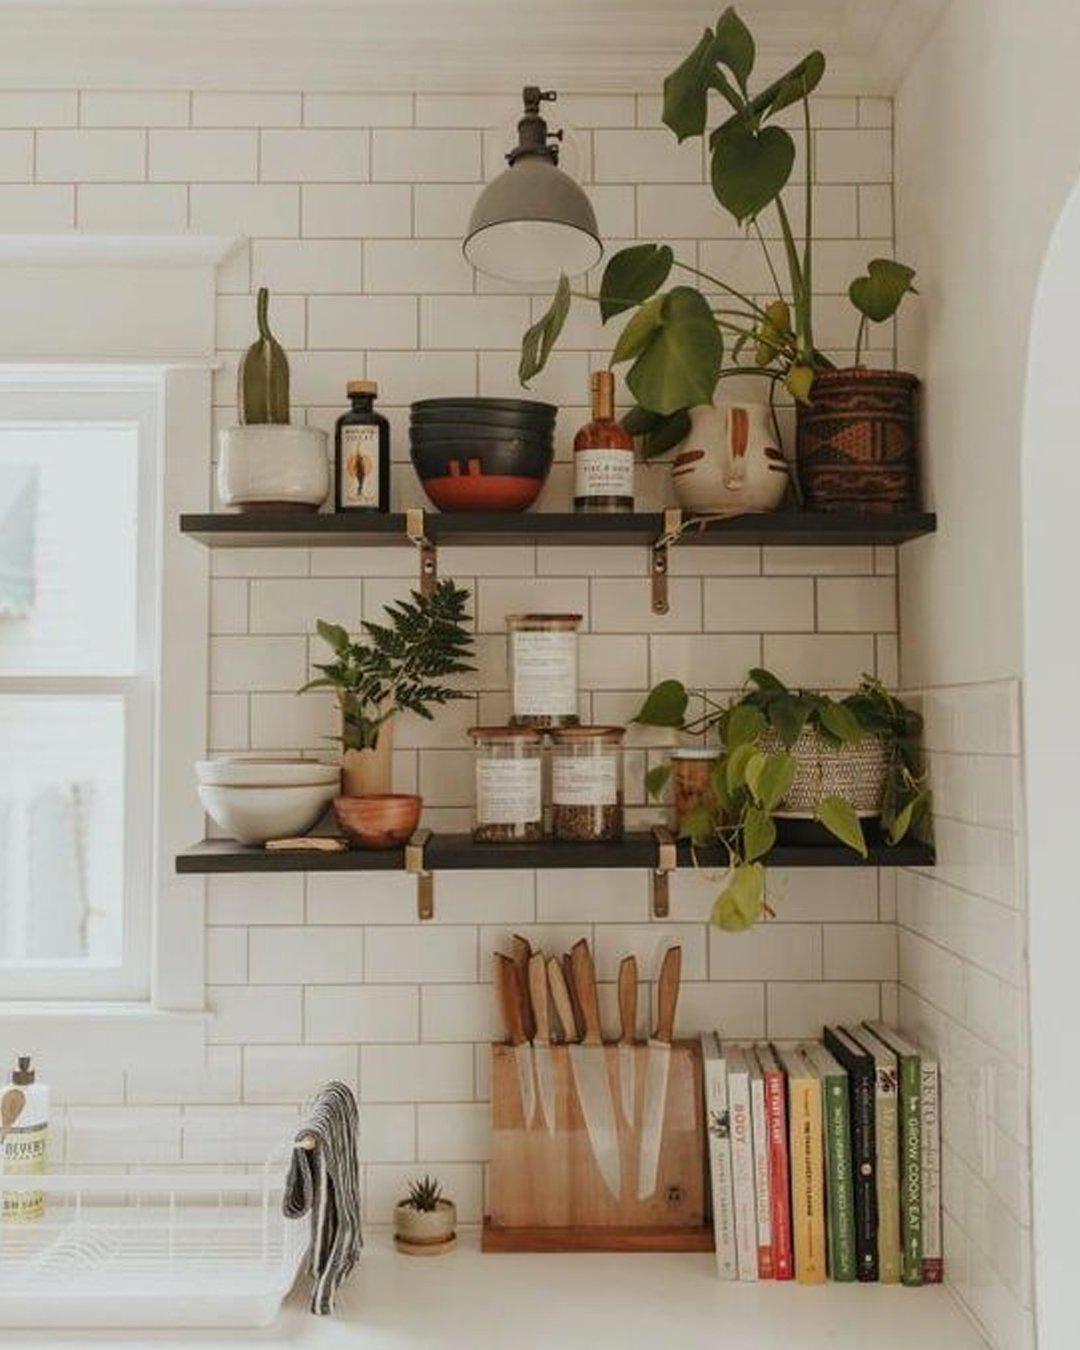 Como decorar a cozinha - Como decorar a cozinha - Como decorar a cozinha - Como decorar a cozinha - Como decorar a cozinha - https://stealthelook.com.br